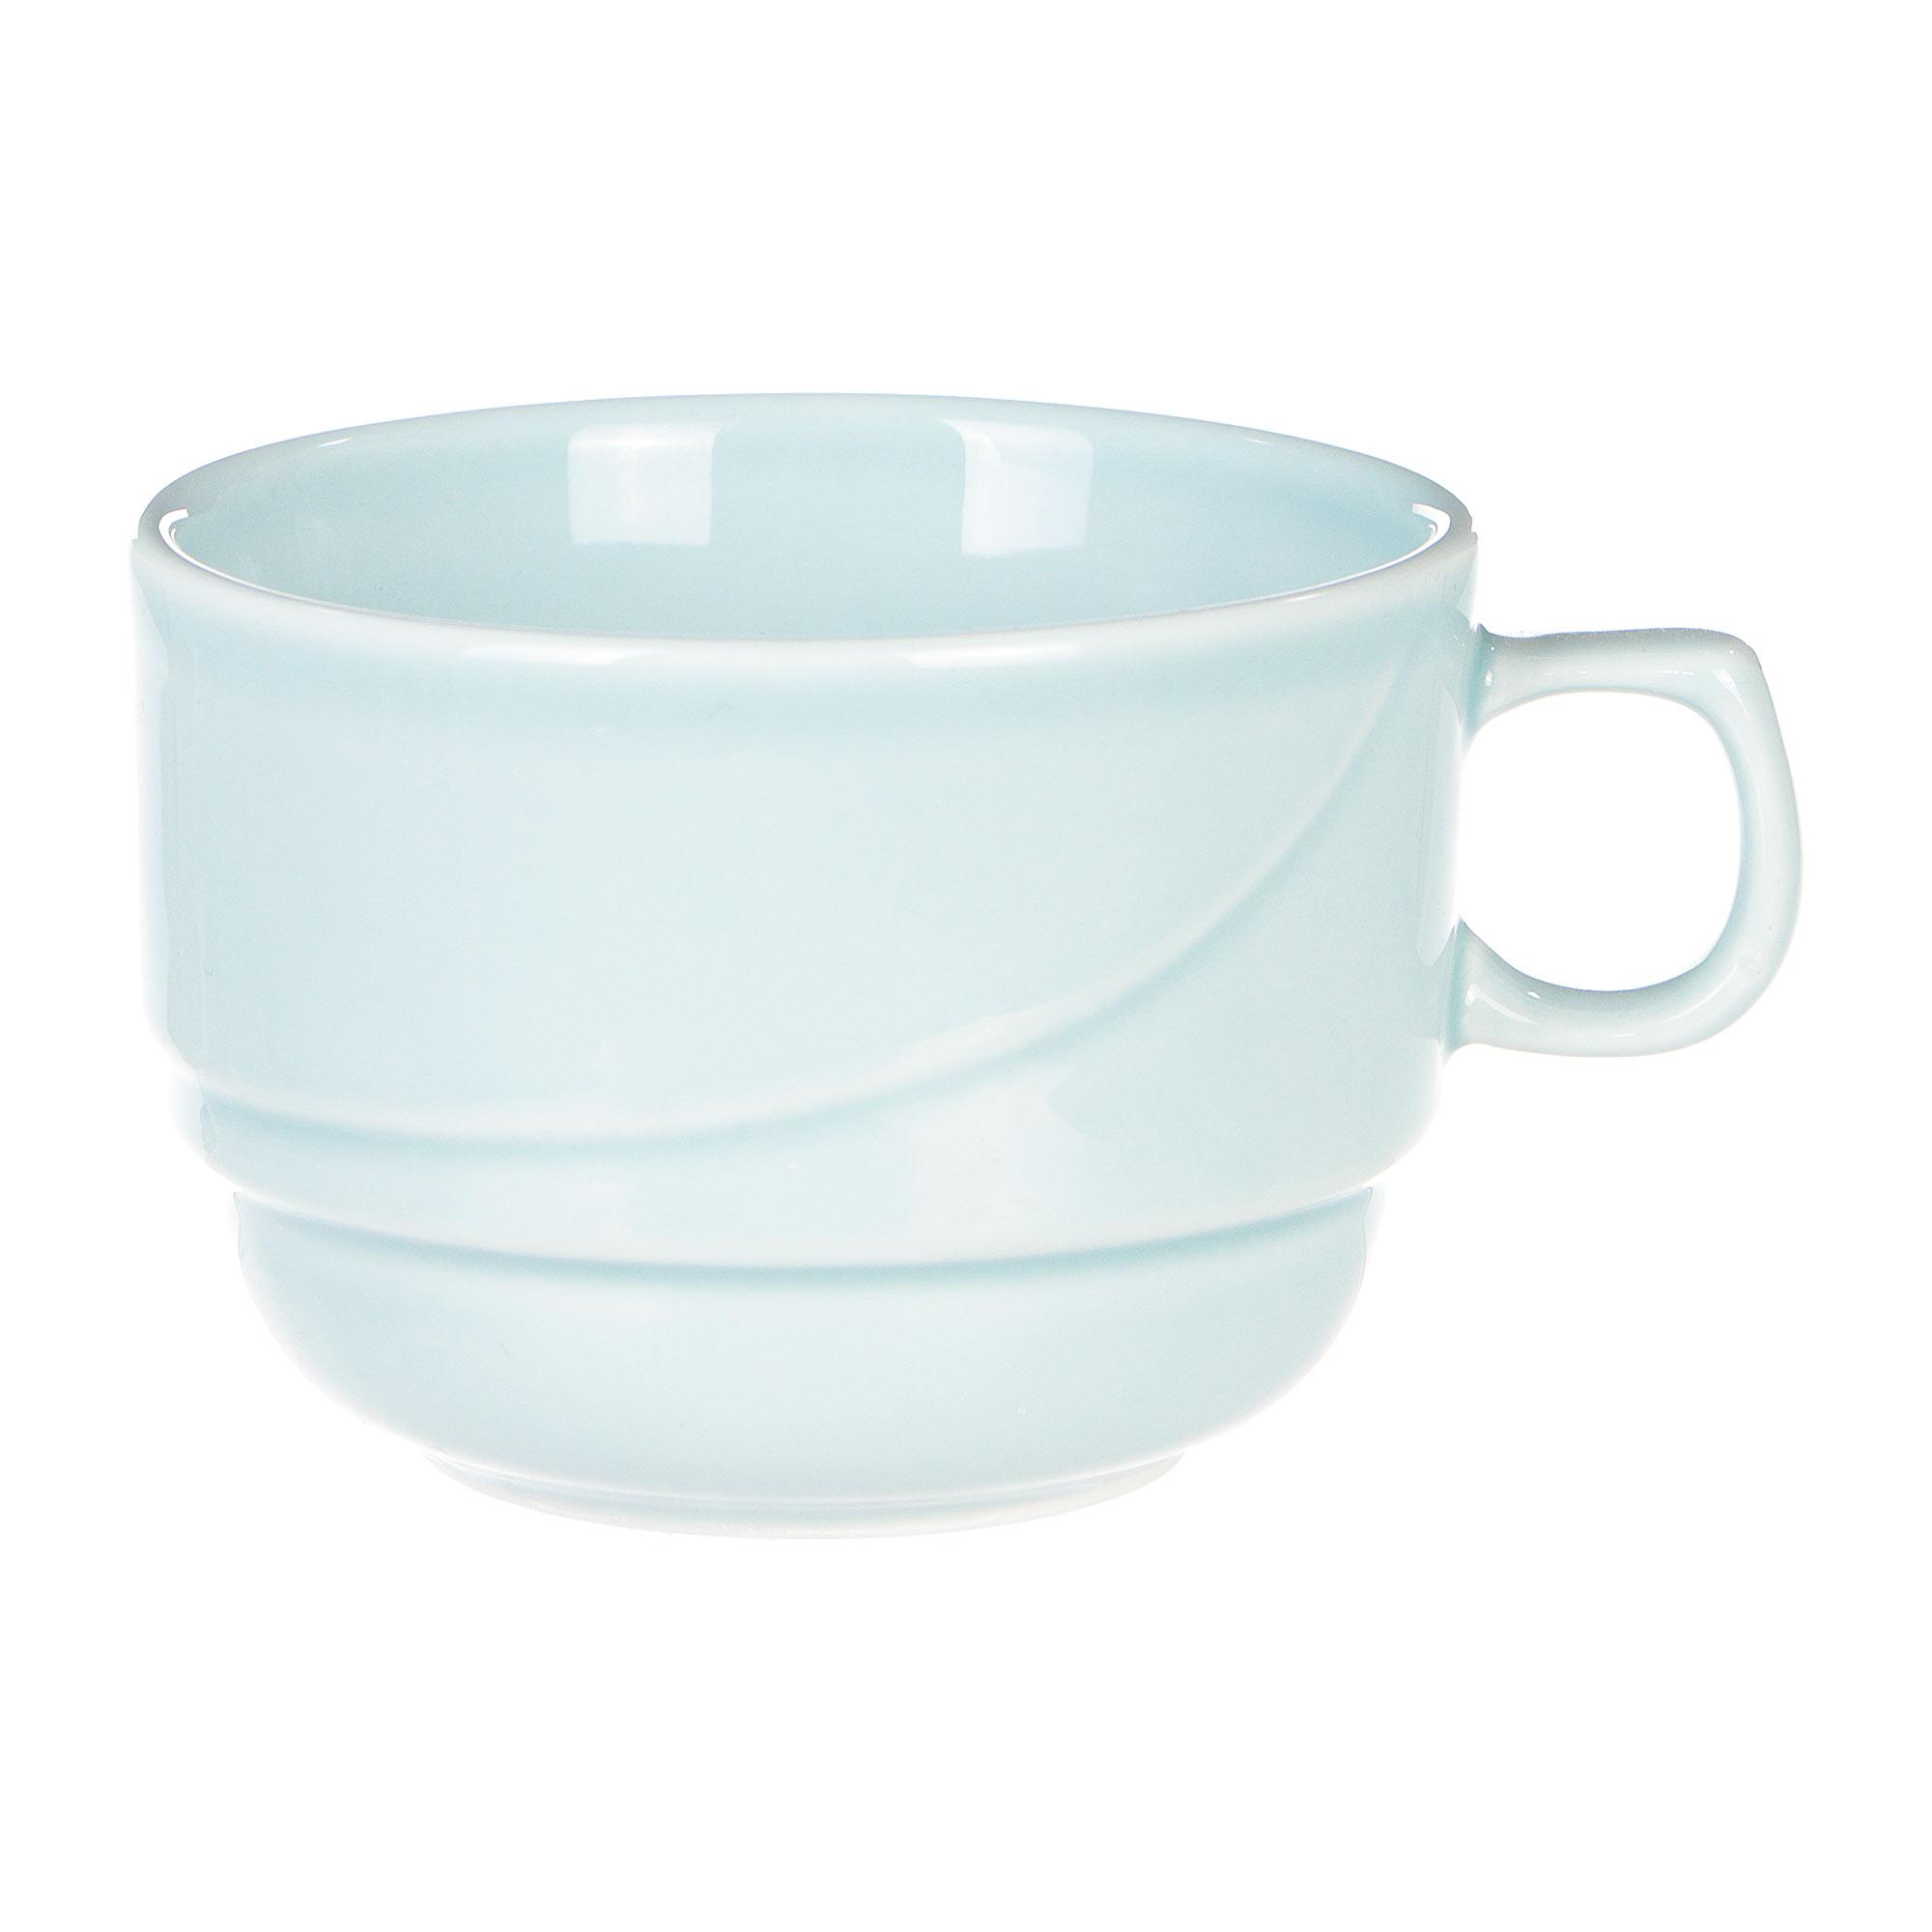 Чашка чайная Башкирский фарфор Принц 190 мл голубая